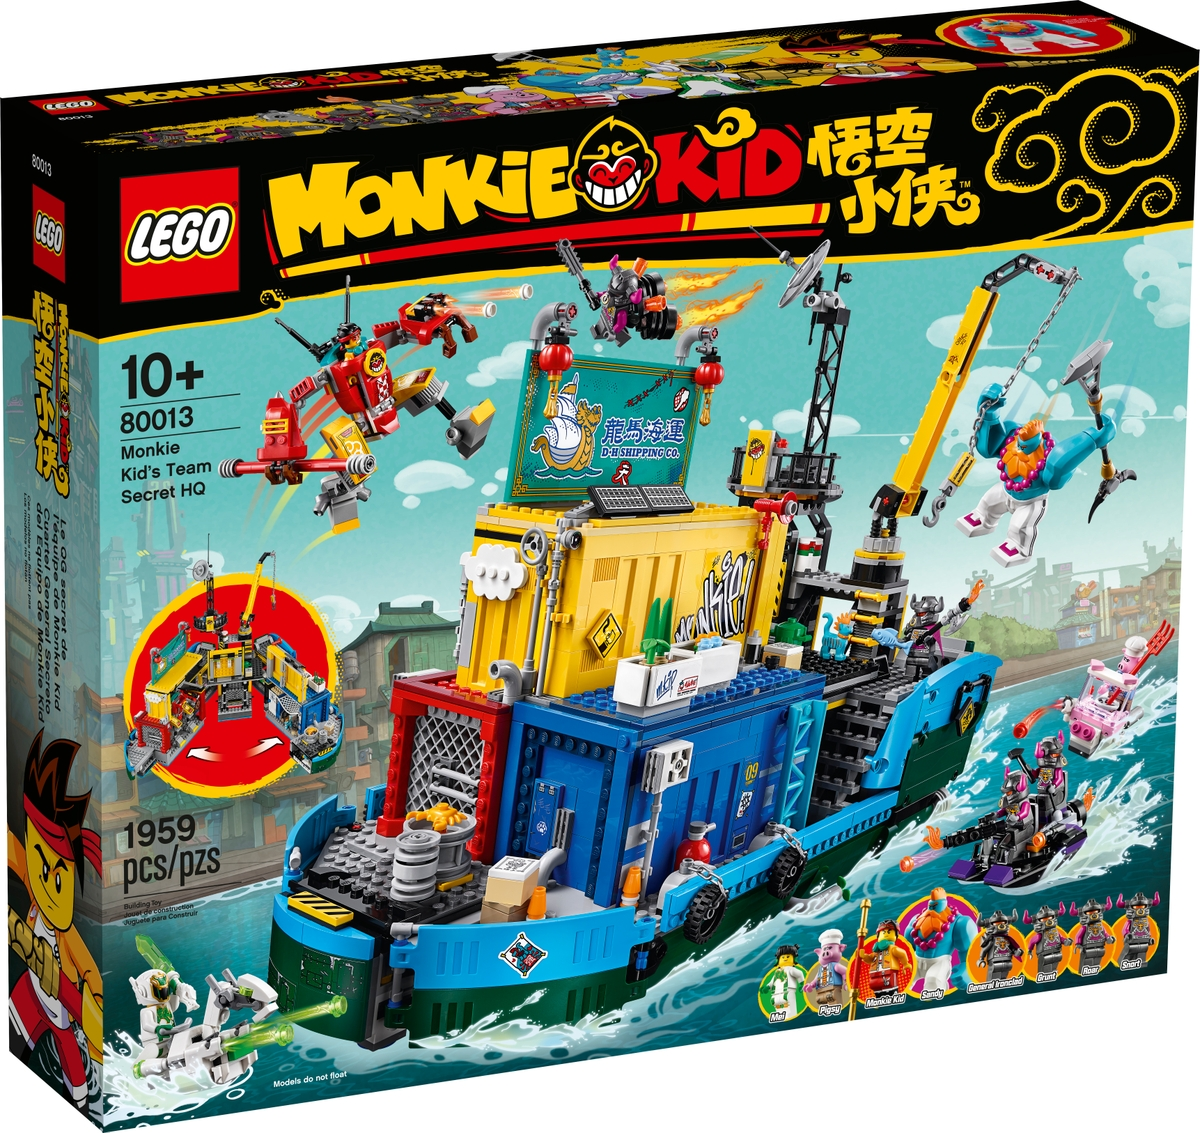 lego 80013 monkie kids team secret hq